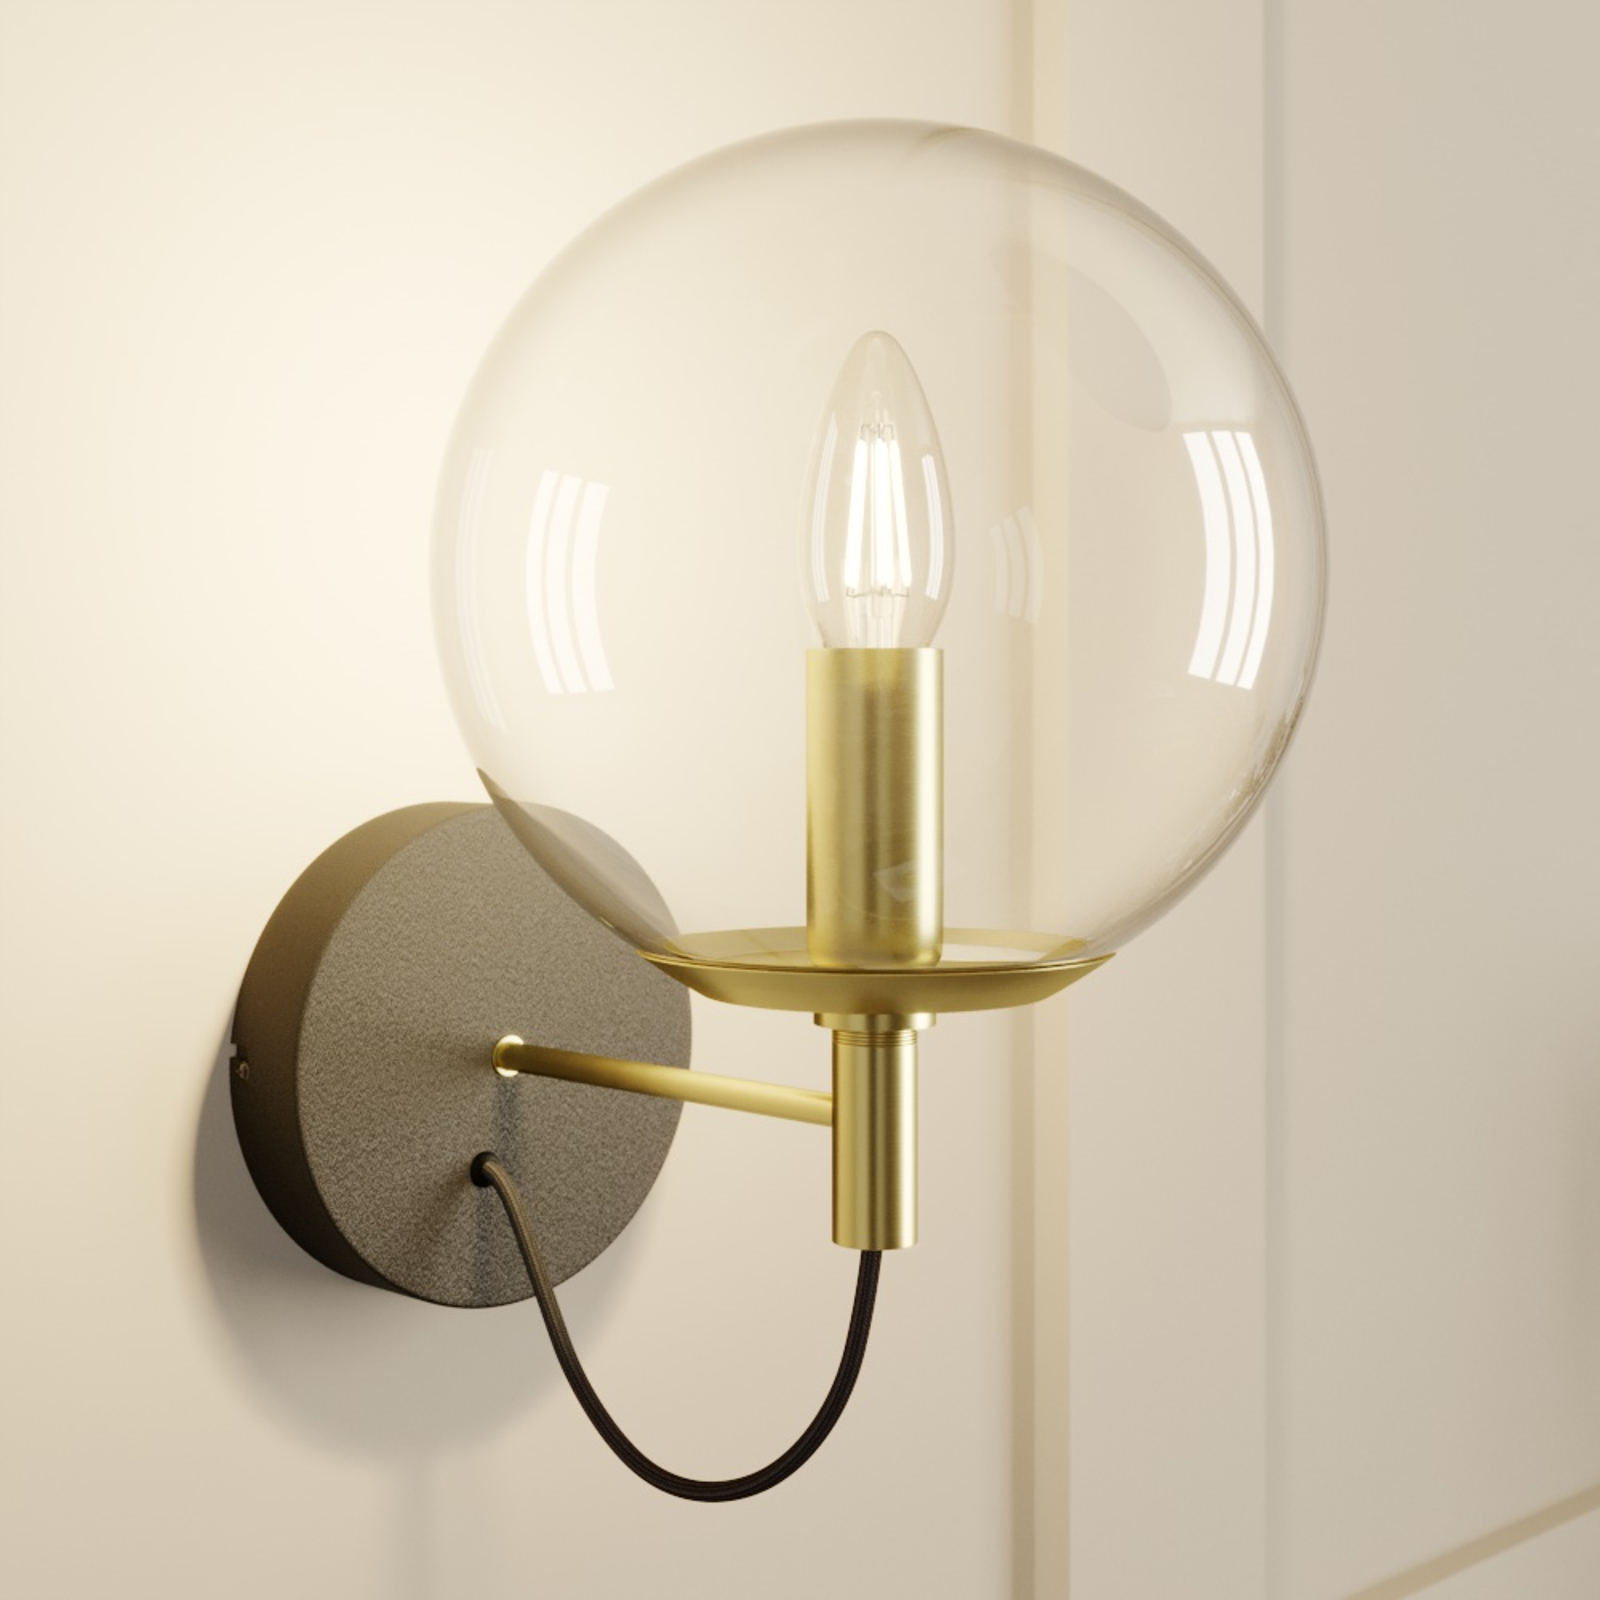 Lucande Sotiana wandlamp, glasbol, messing